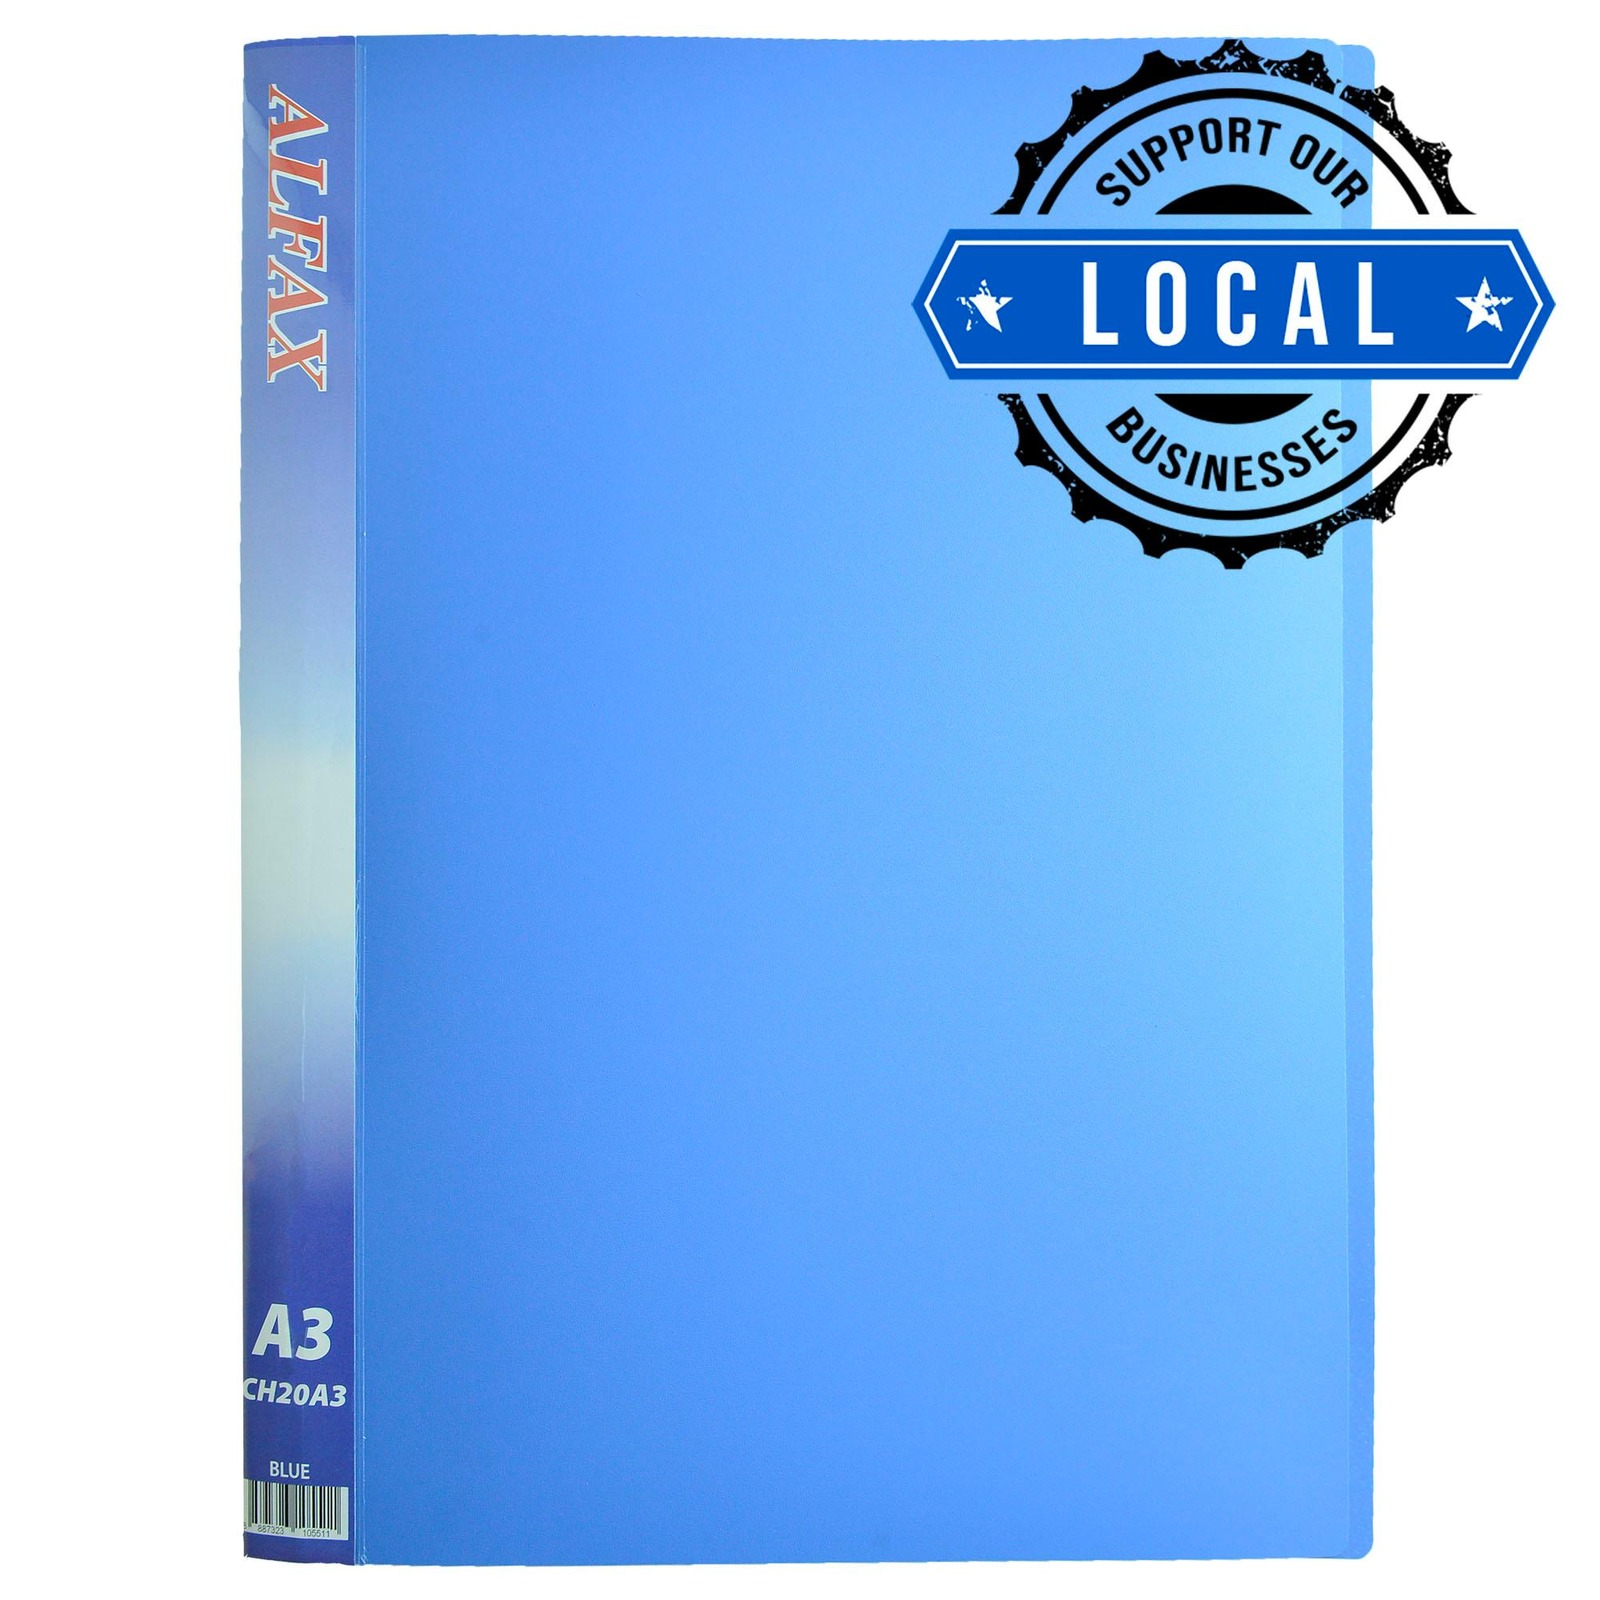 ALFAX CH20A3 Clear Holder 20 Pockets A3 Blue